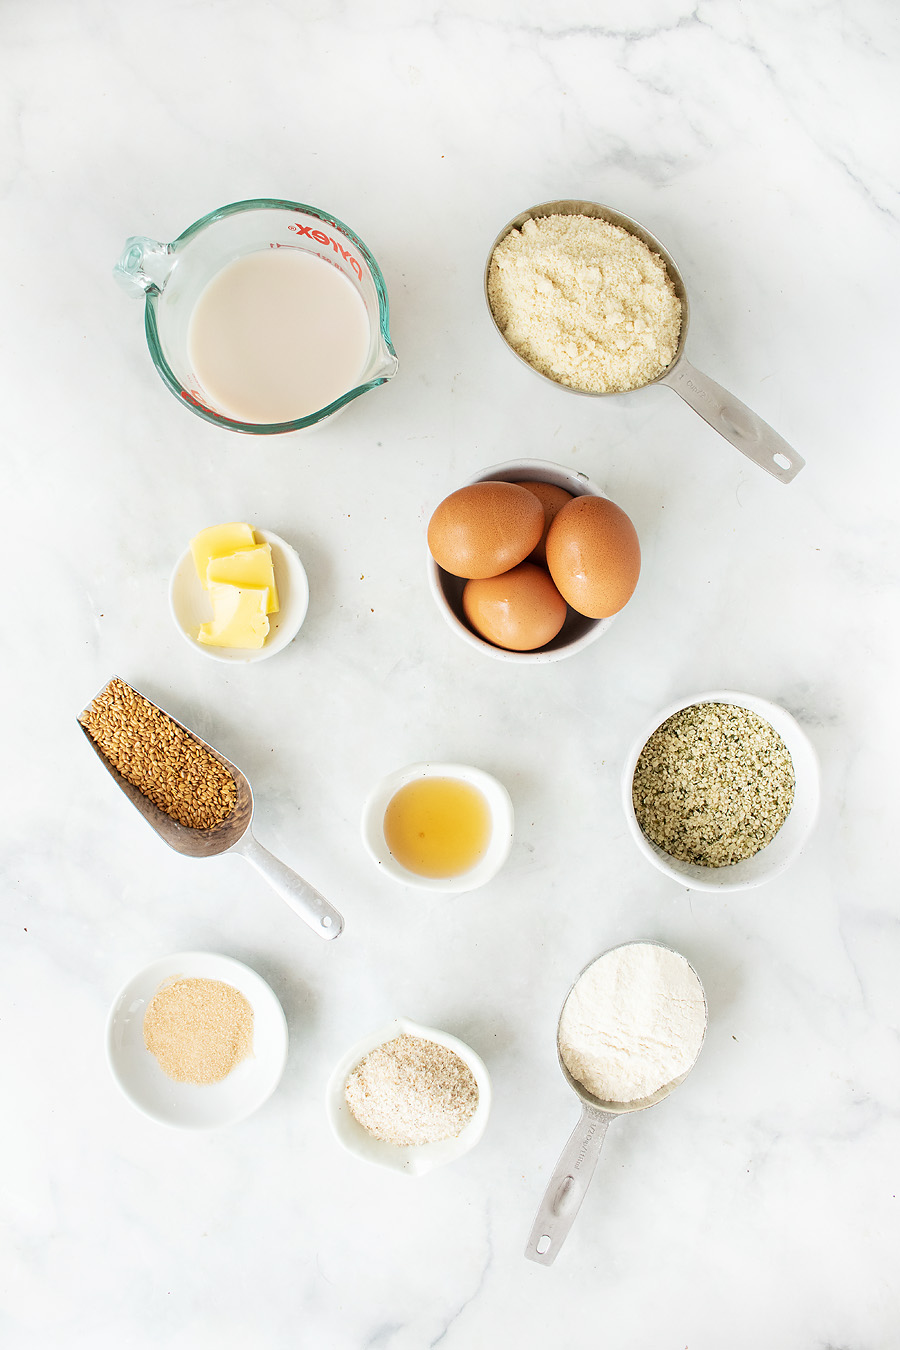 Keto Bread Ingredients